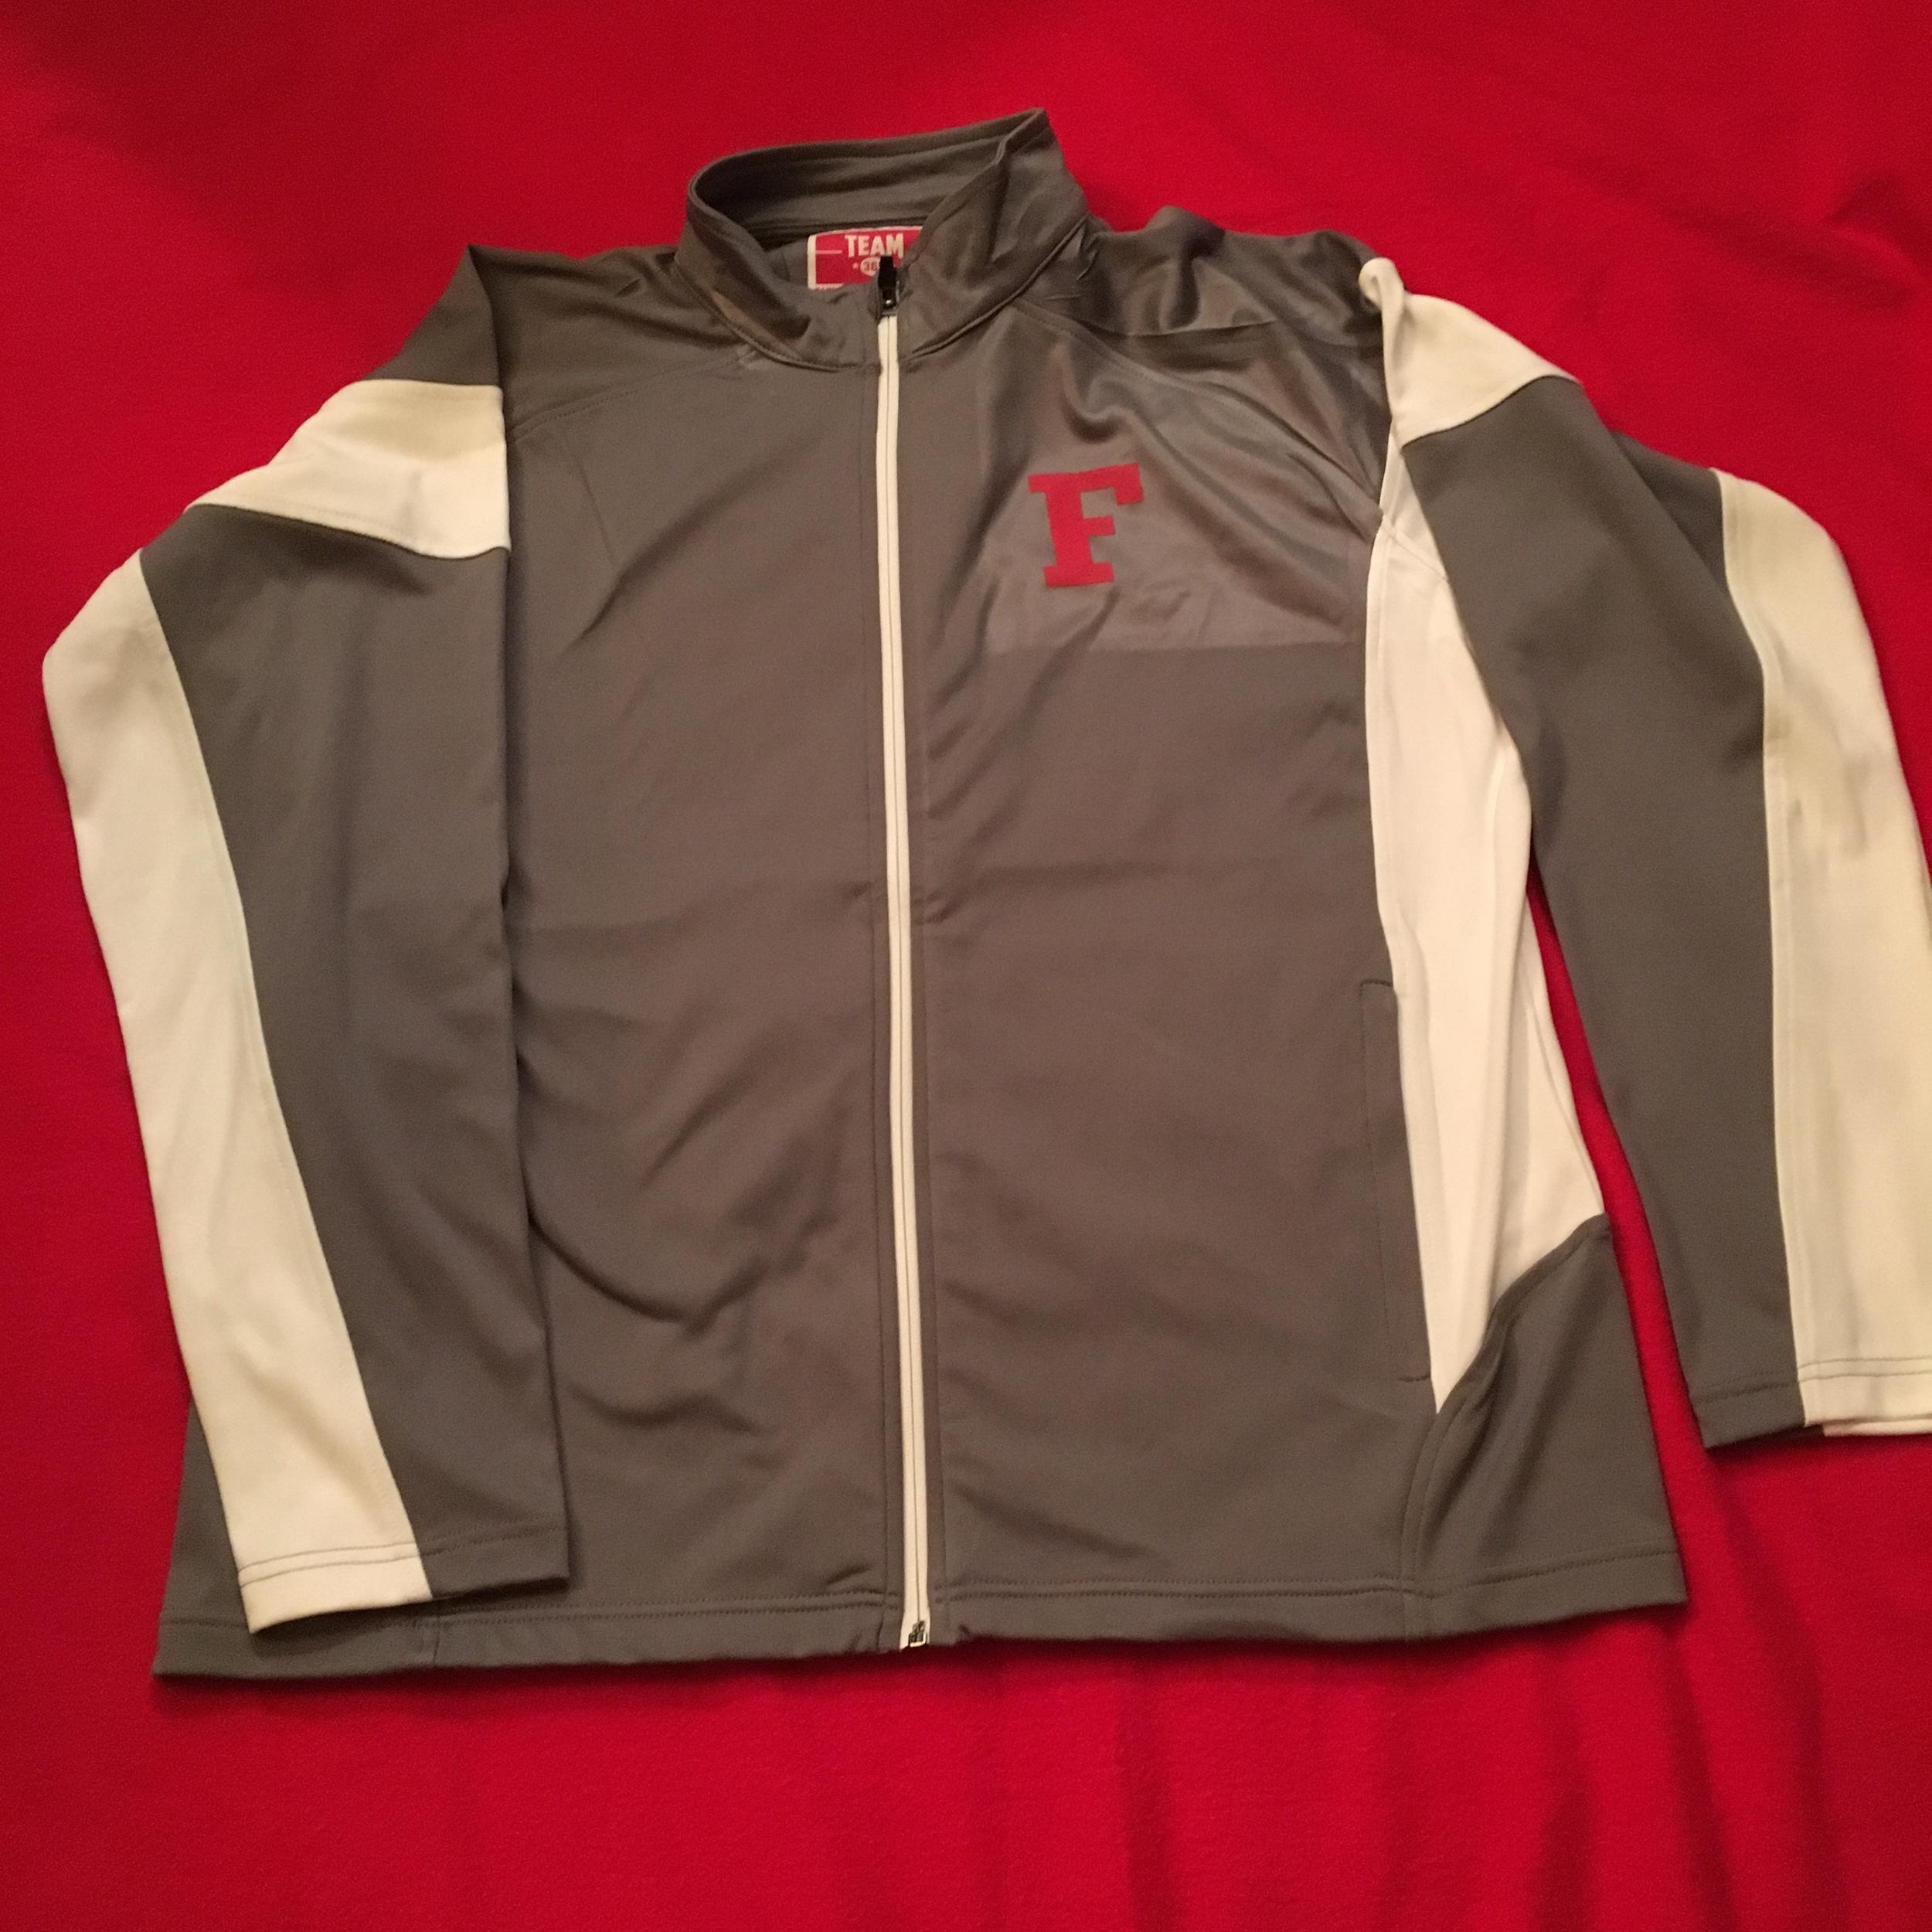 SW Men's grey/white full zip jacket w/ front logo